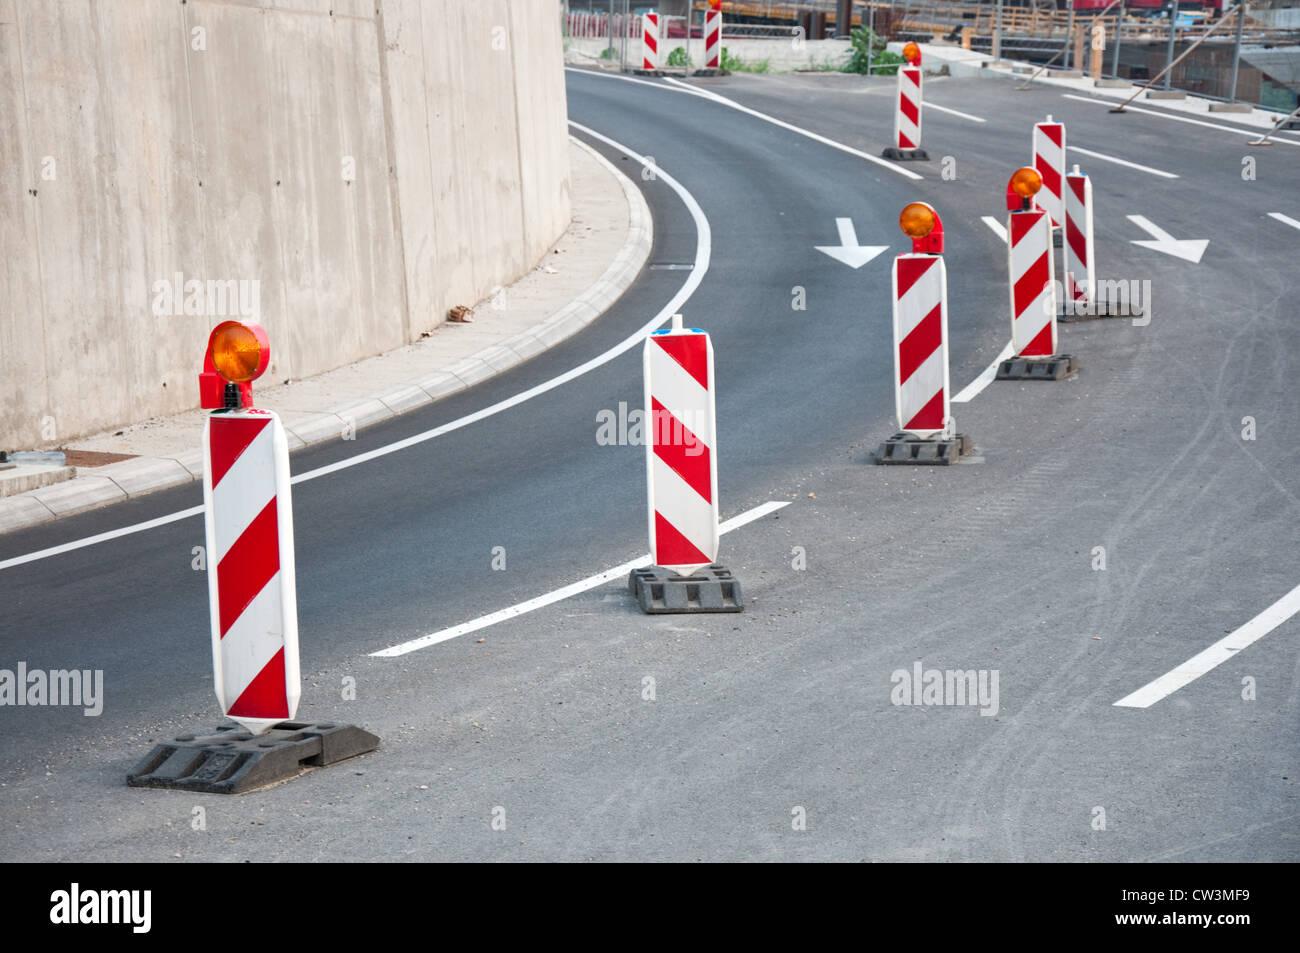 Cautions on asphalt road, common traffic signalization - Stock Image